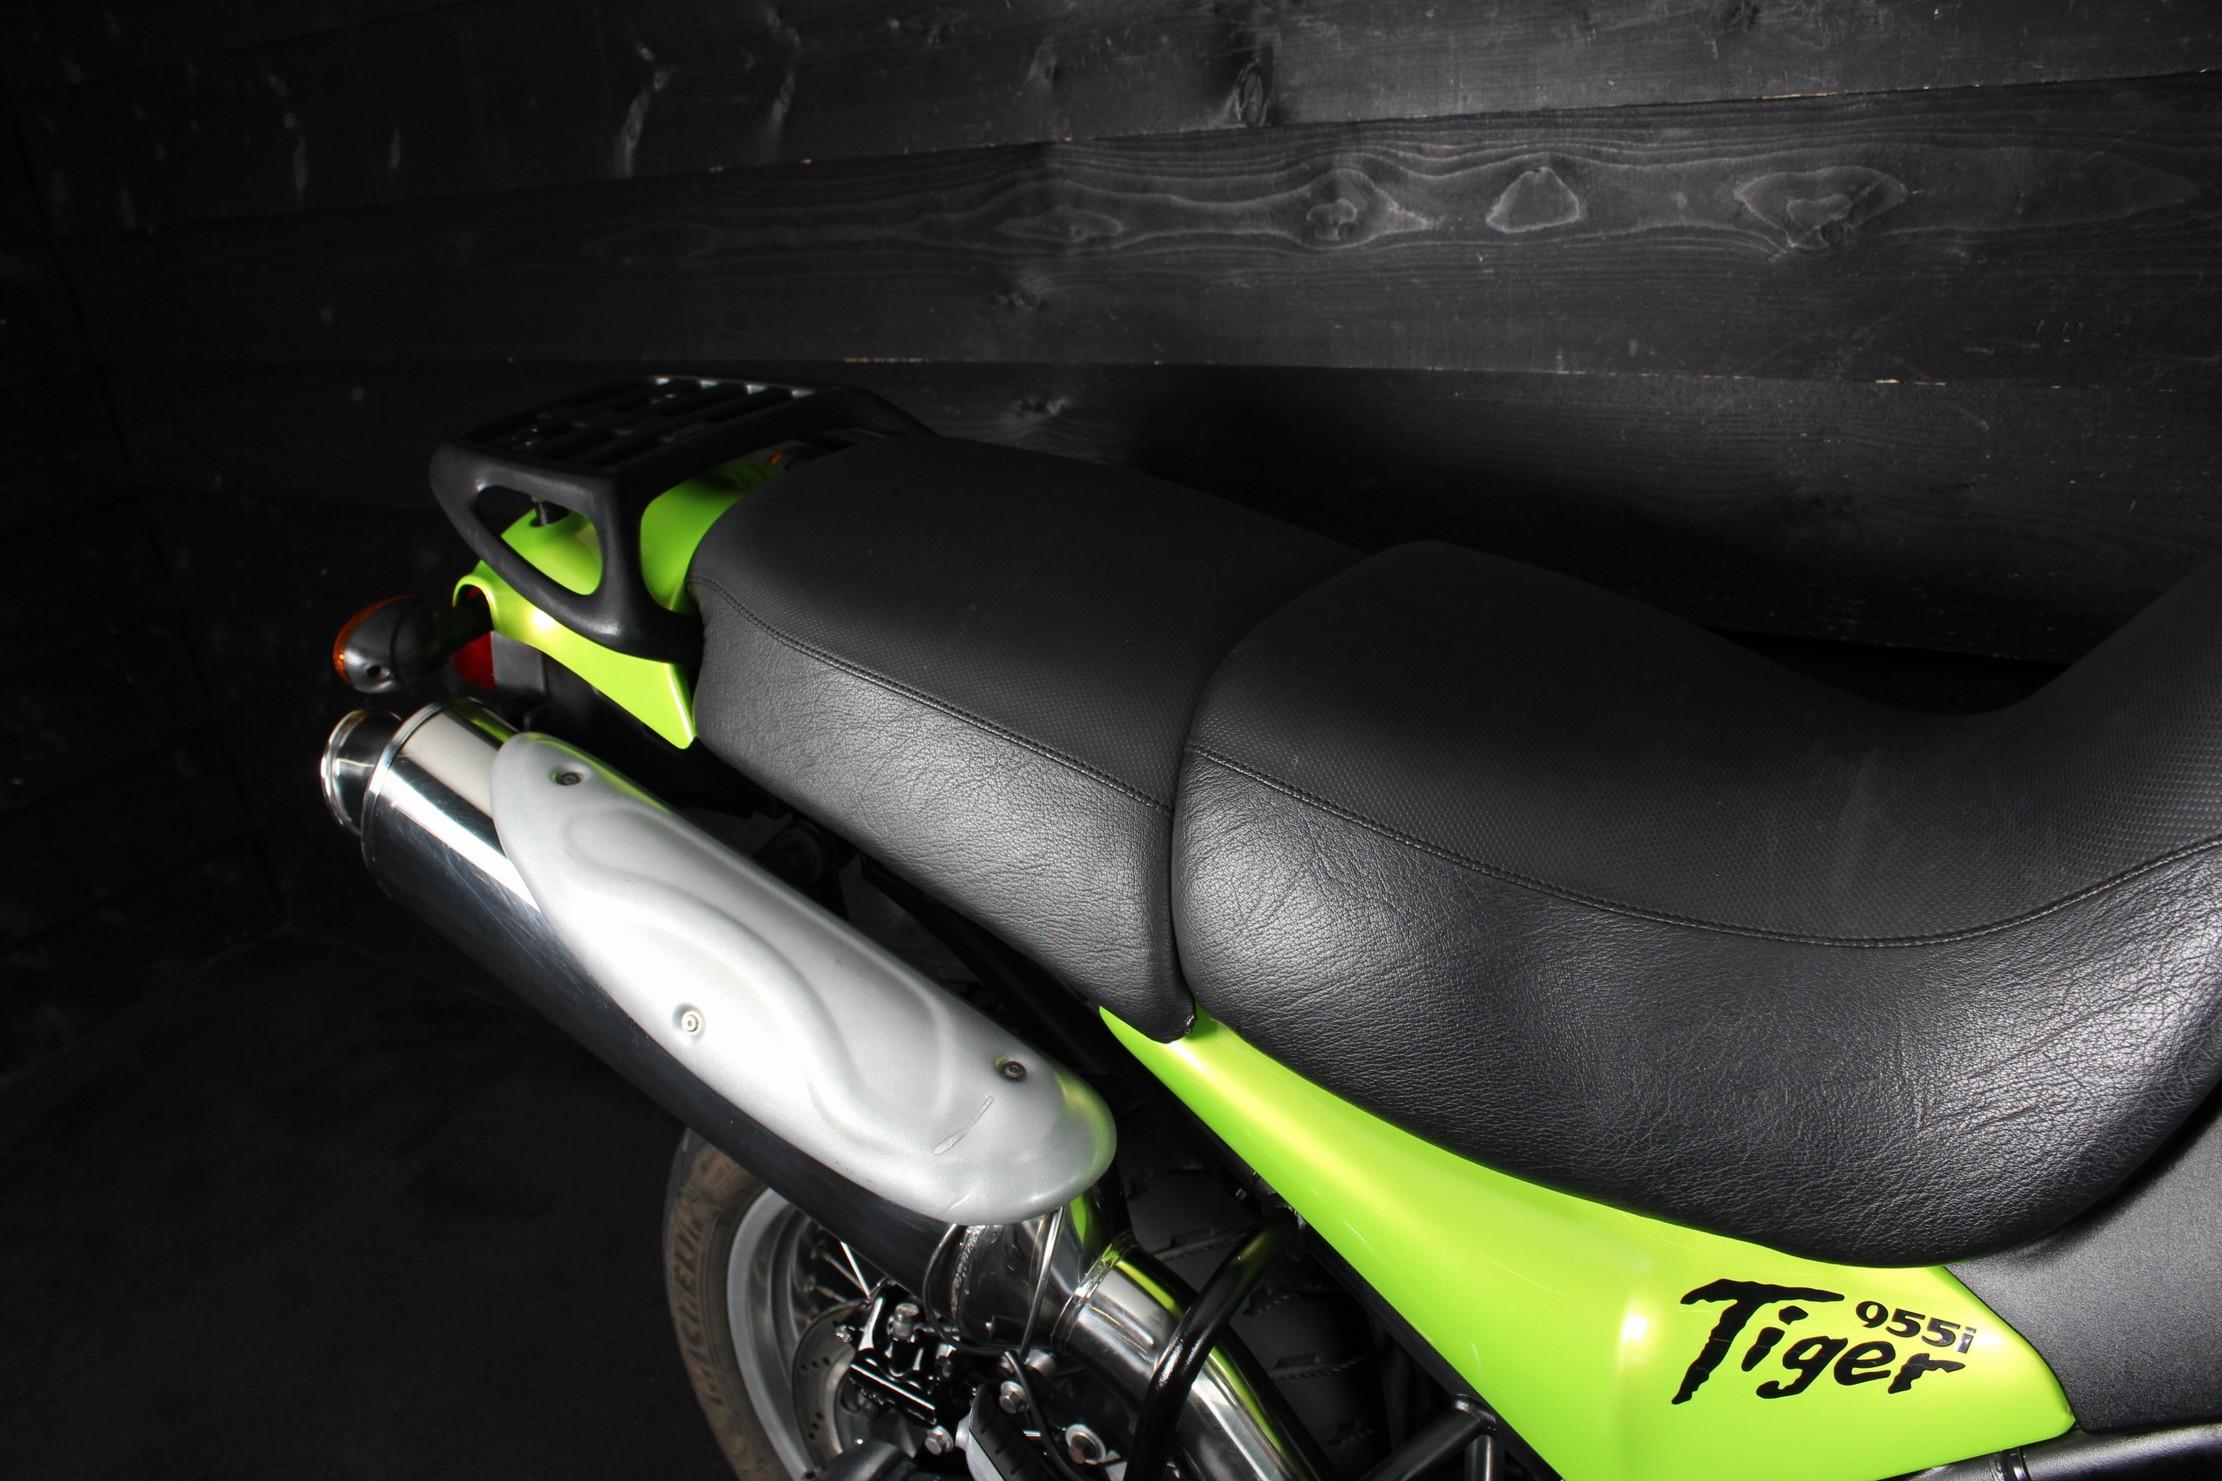 TRIUMPH - Tiger 955 i